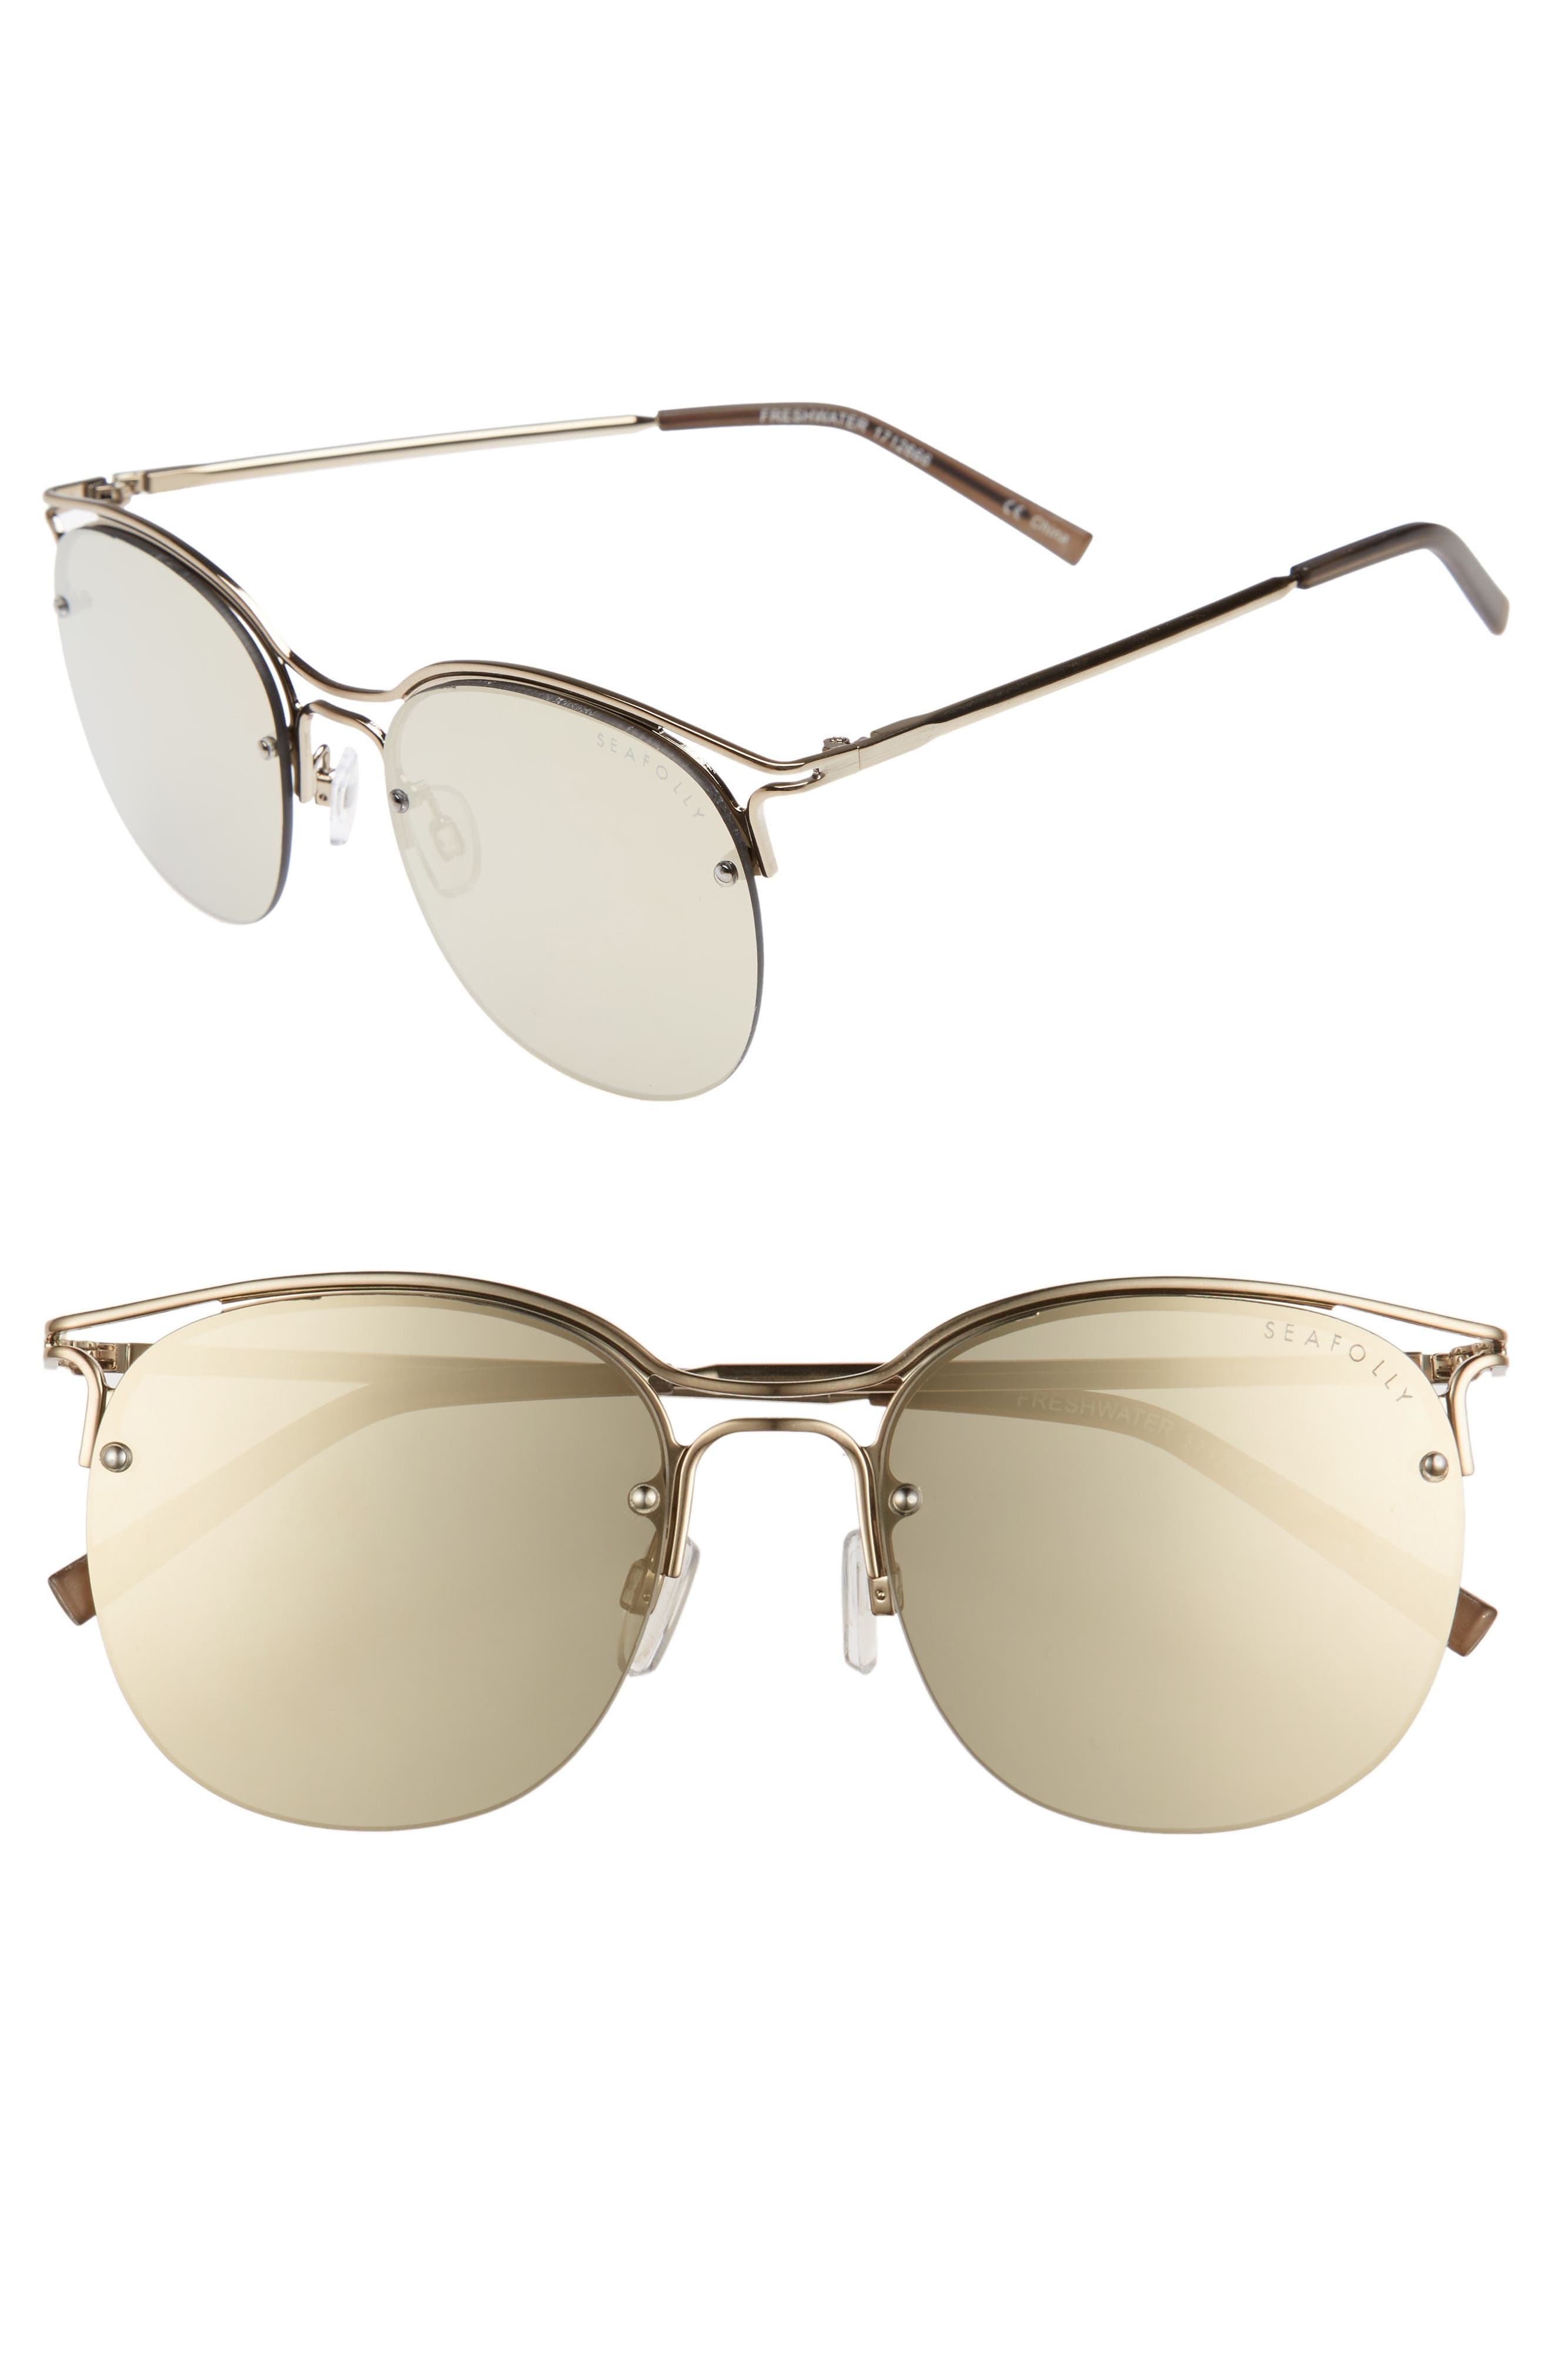 Seafolly Freshwater 55m Metal Sunglasses